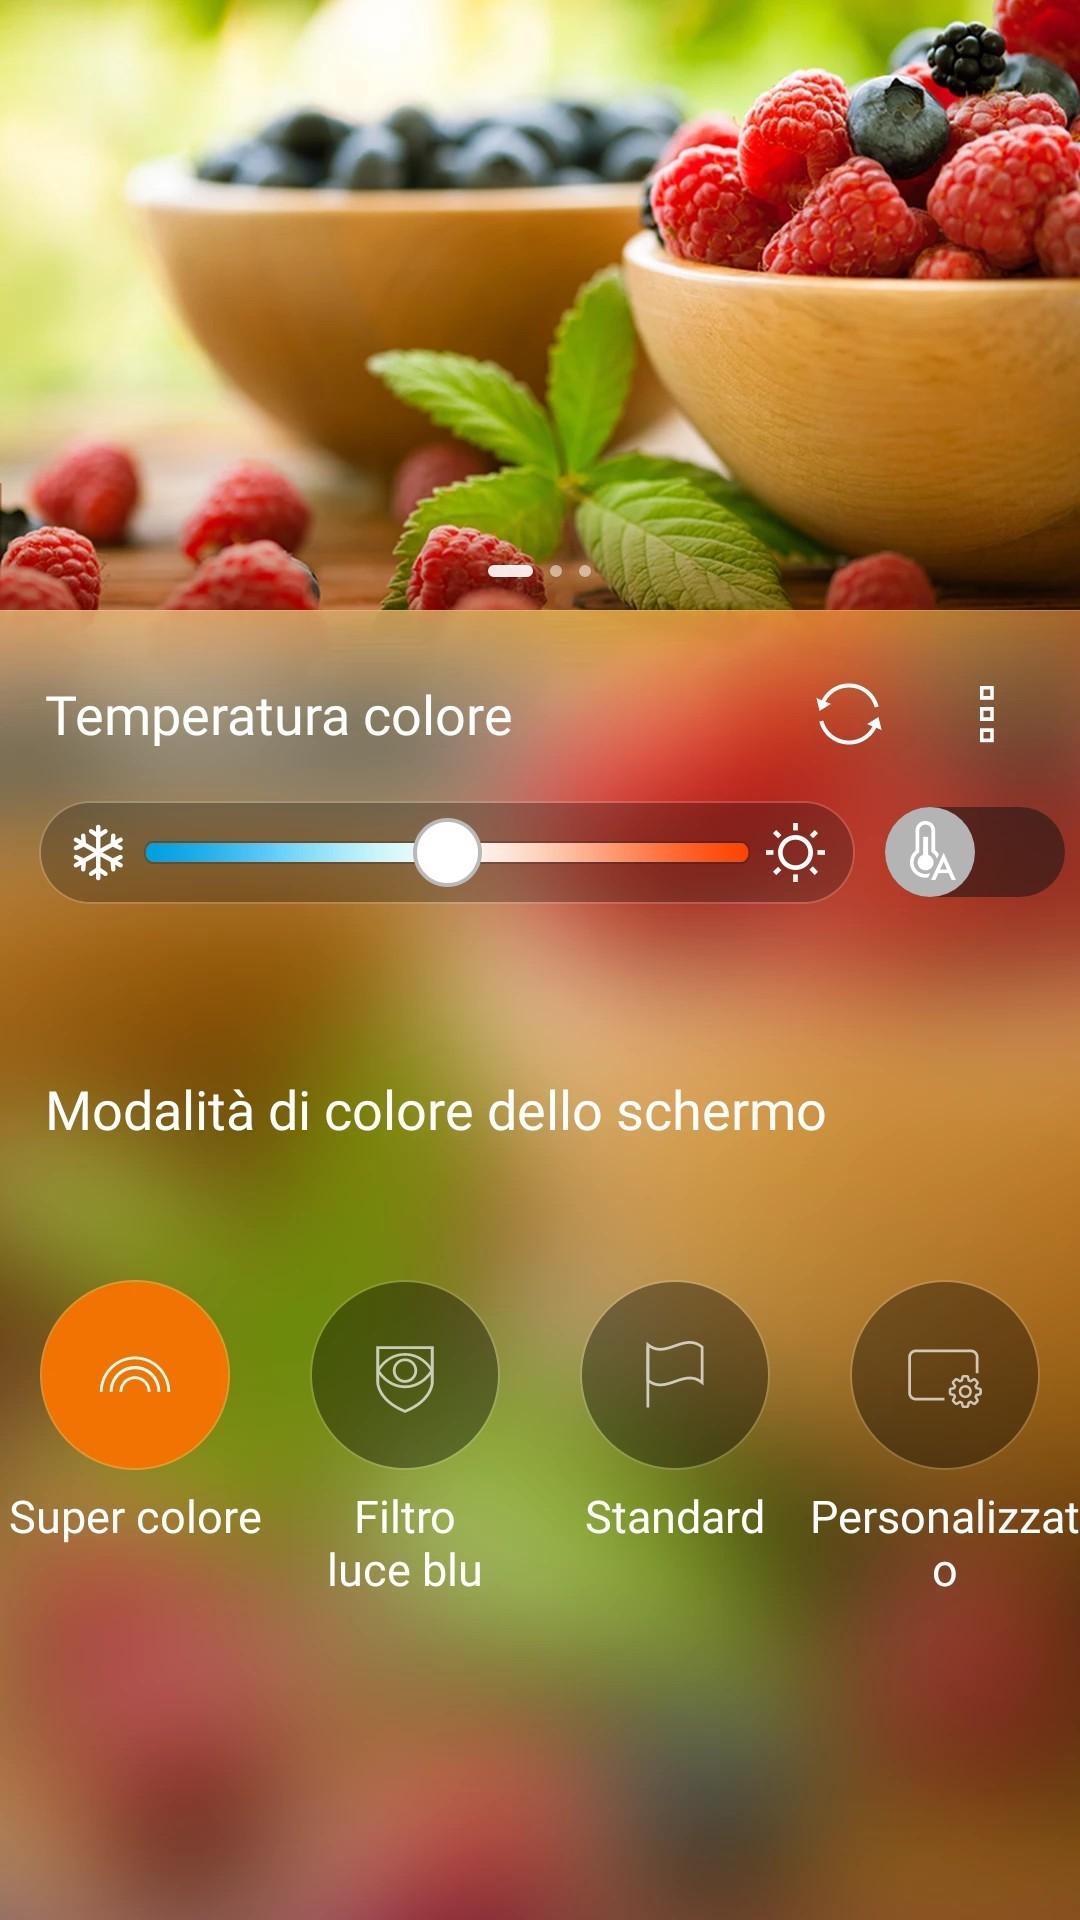 Recensione ASUS Zenfone 4 Selfie Pro, un valido camera-phone?